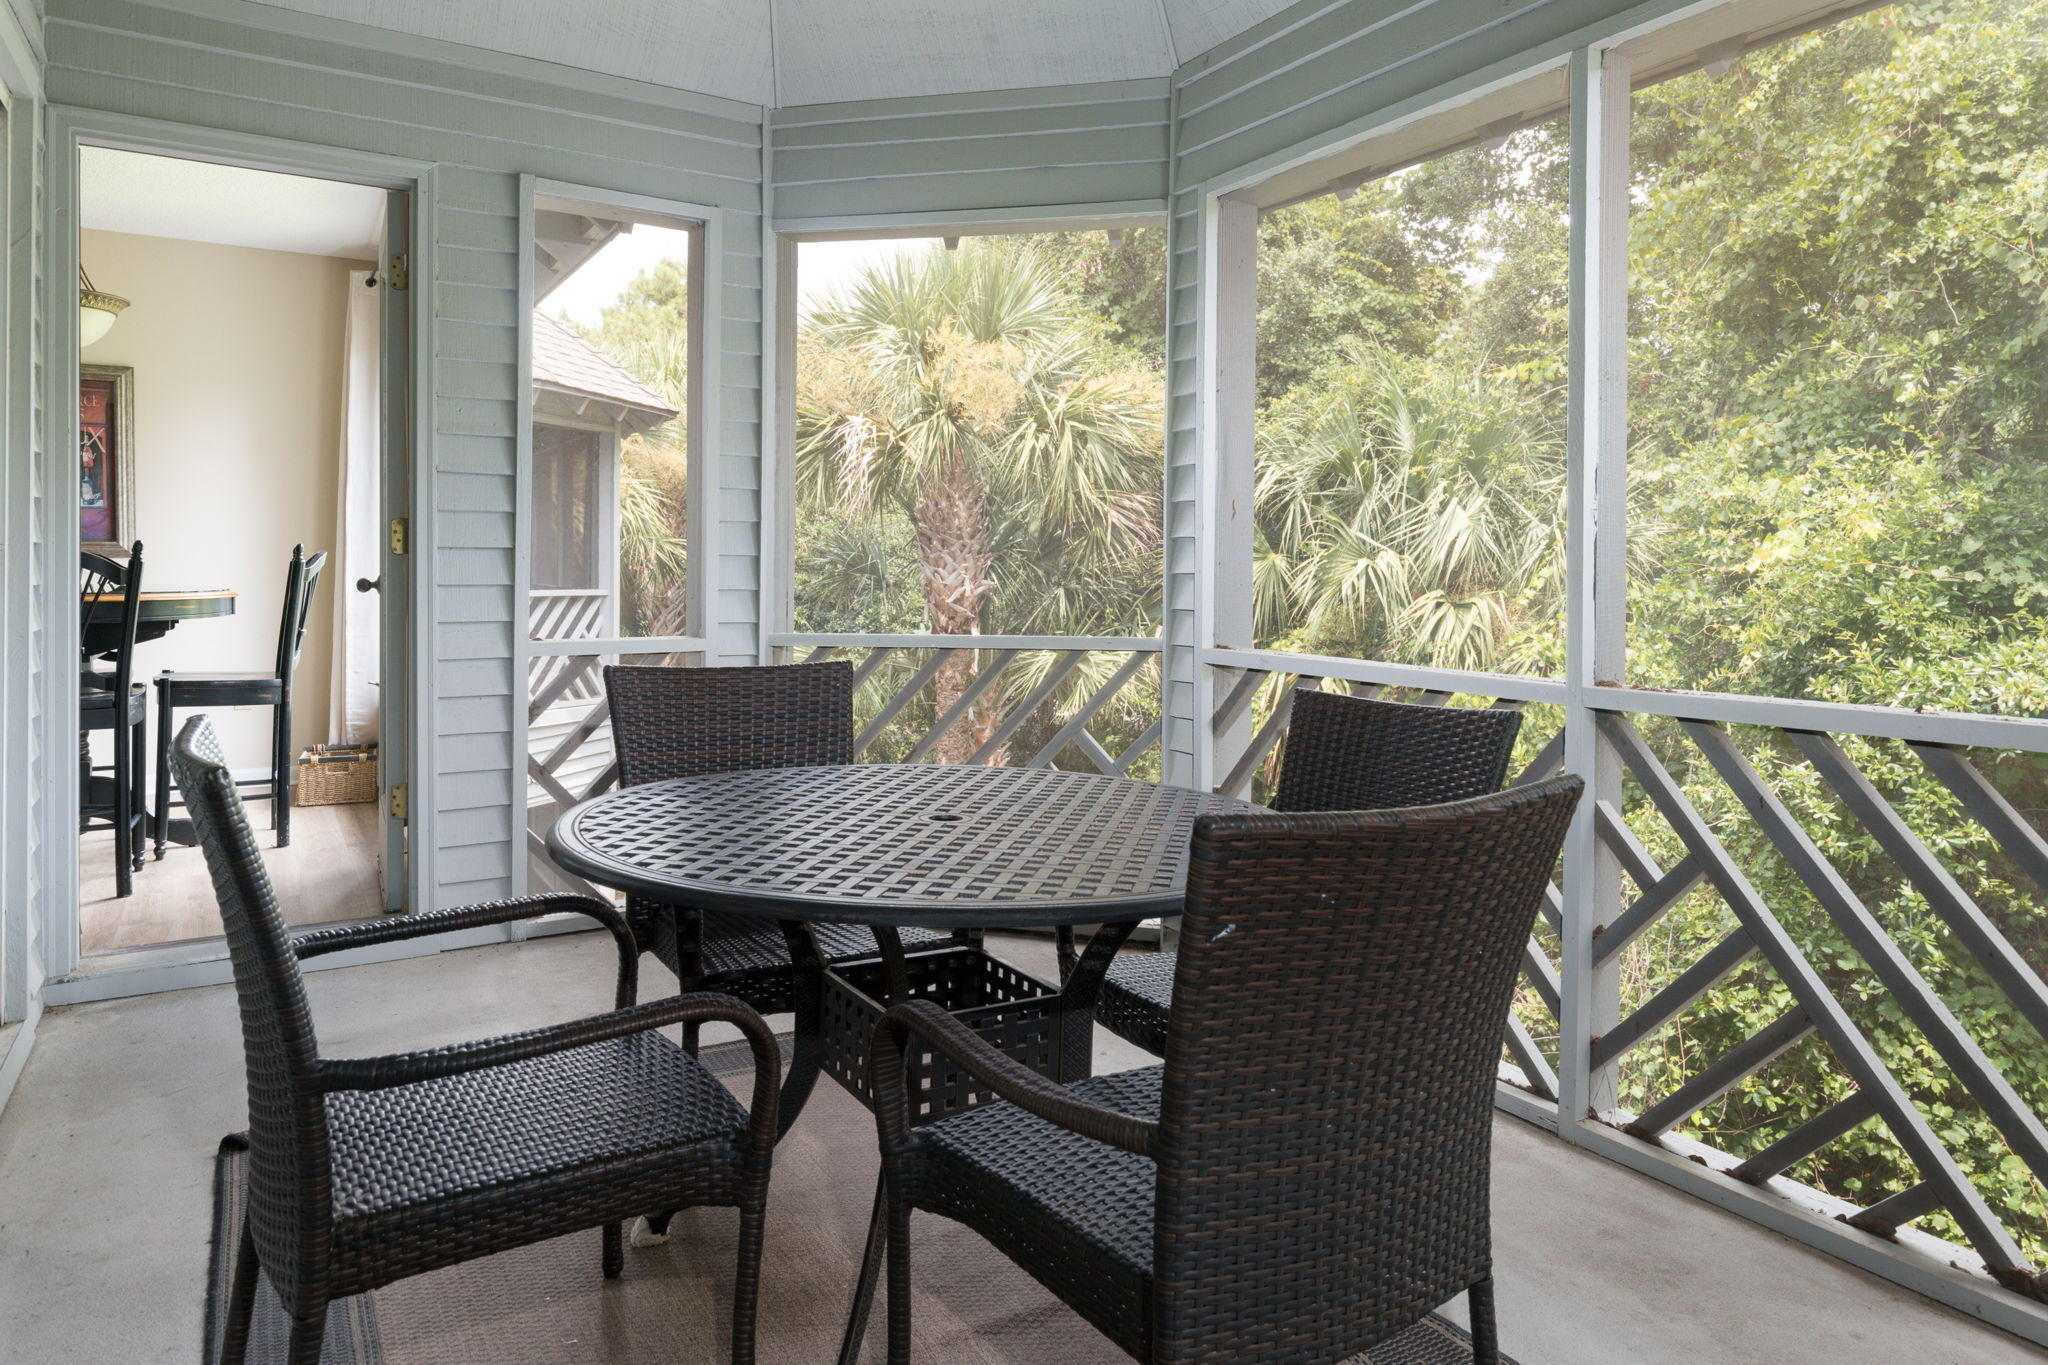 Kiawah Island Homes For Sale - 5534 Green Dolphin, Kiawah Island, SC - 32